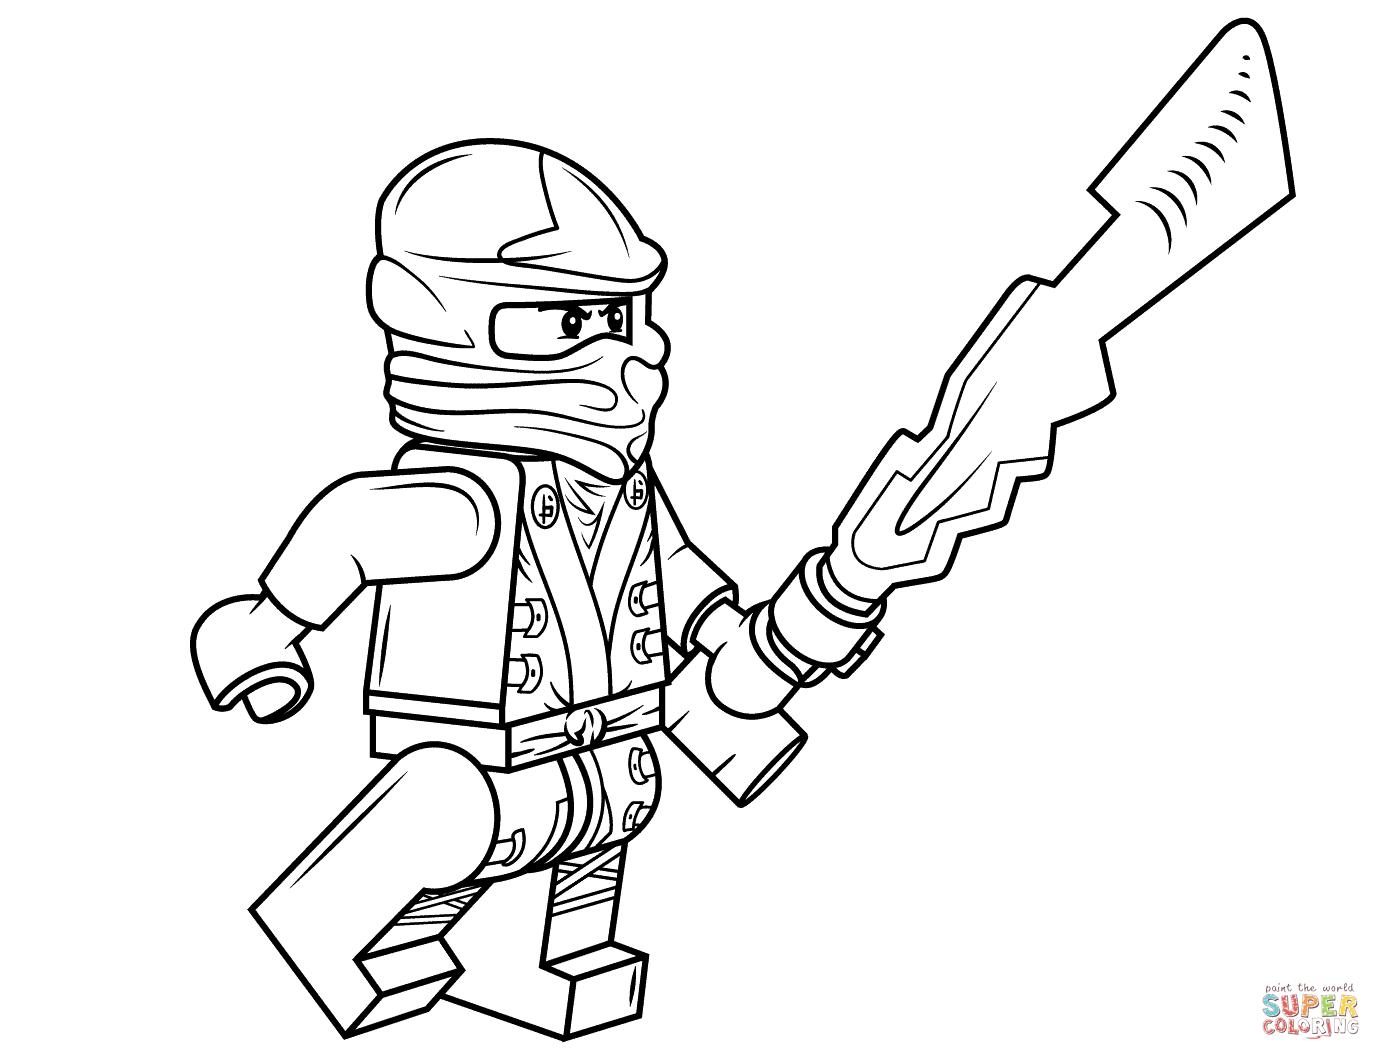 Ausmalbilder Lego Ninjago - Malvorlagen Kostenlos Zum Ausdrucken über Ausmalbilder Ninjago Kostenlos